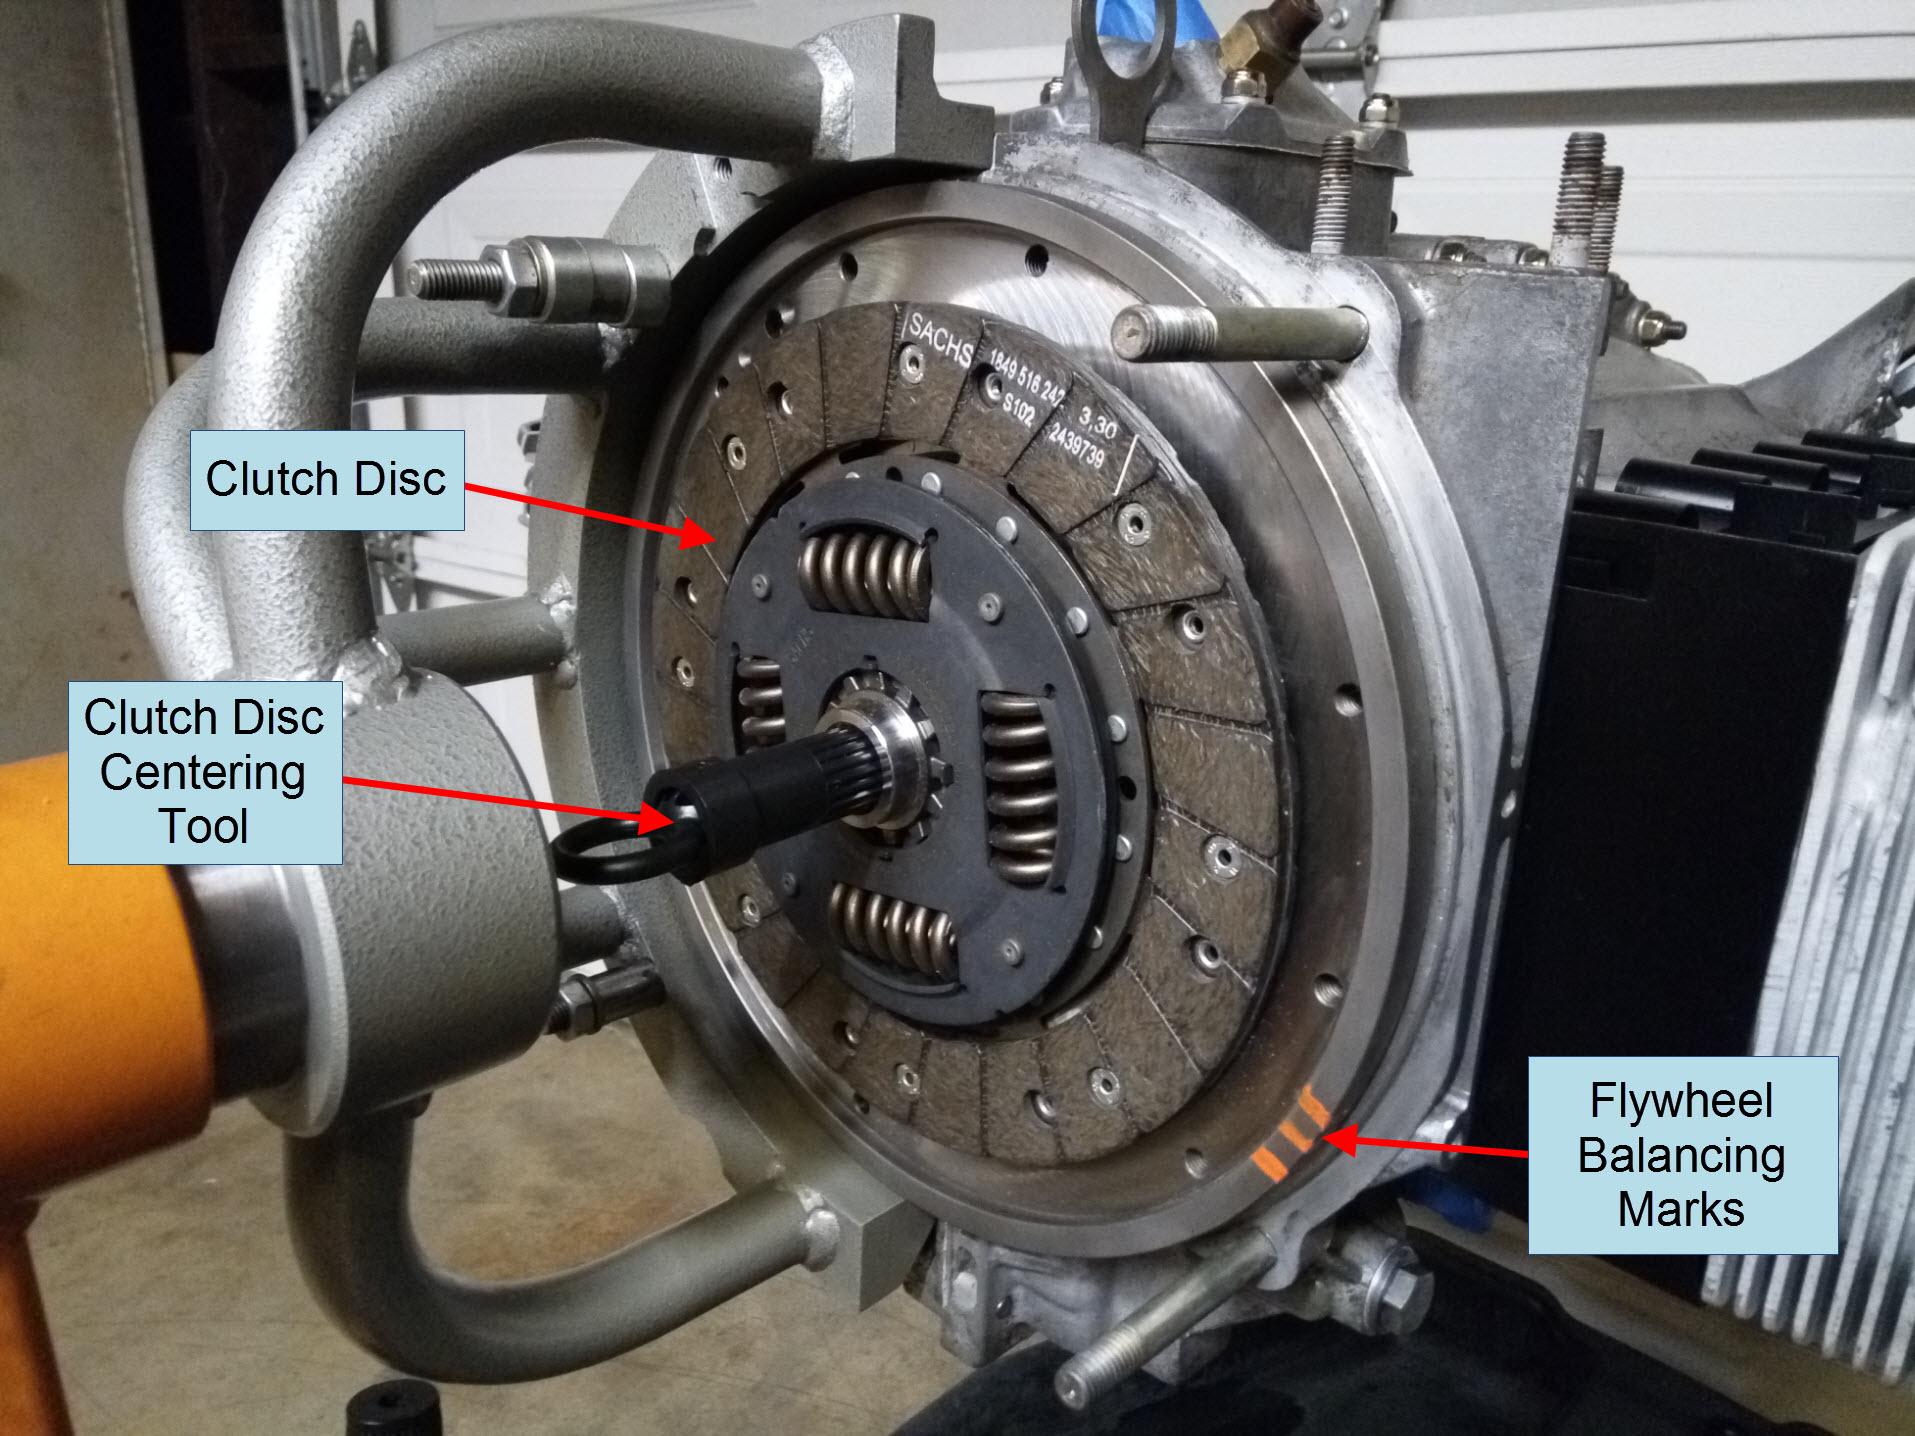 Air-cooled Porsche 911 clutch disc installation.